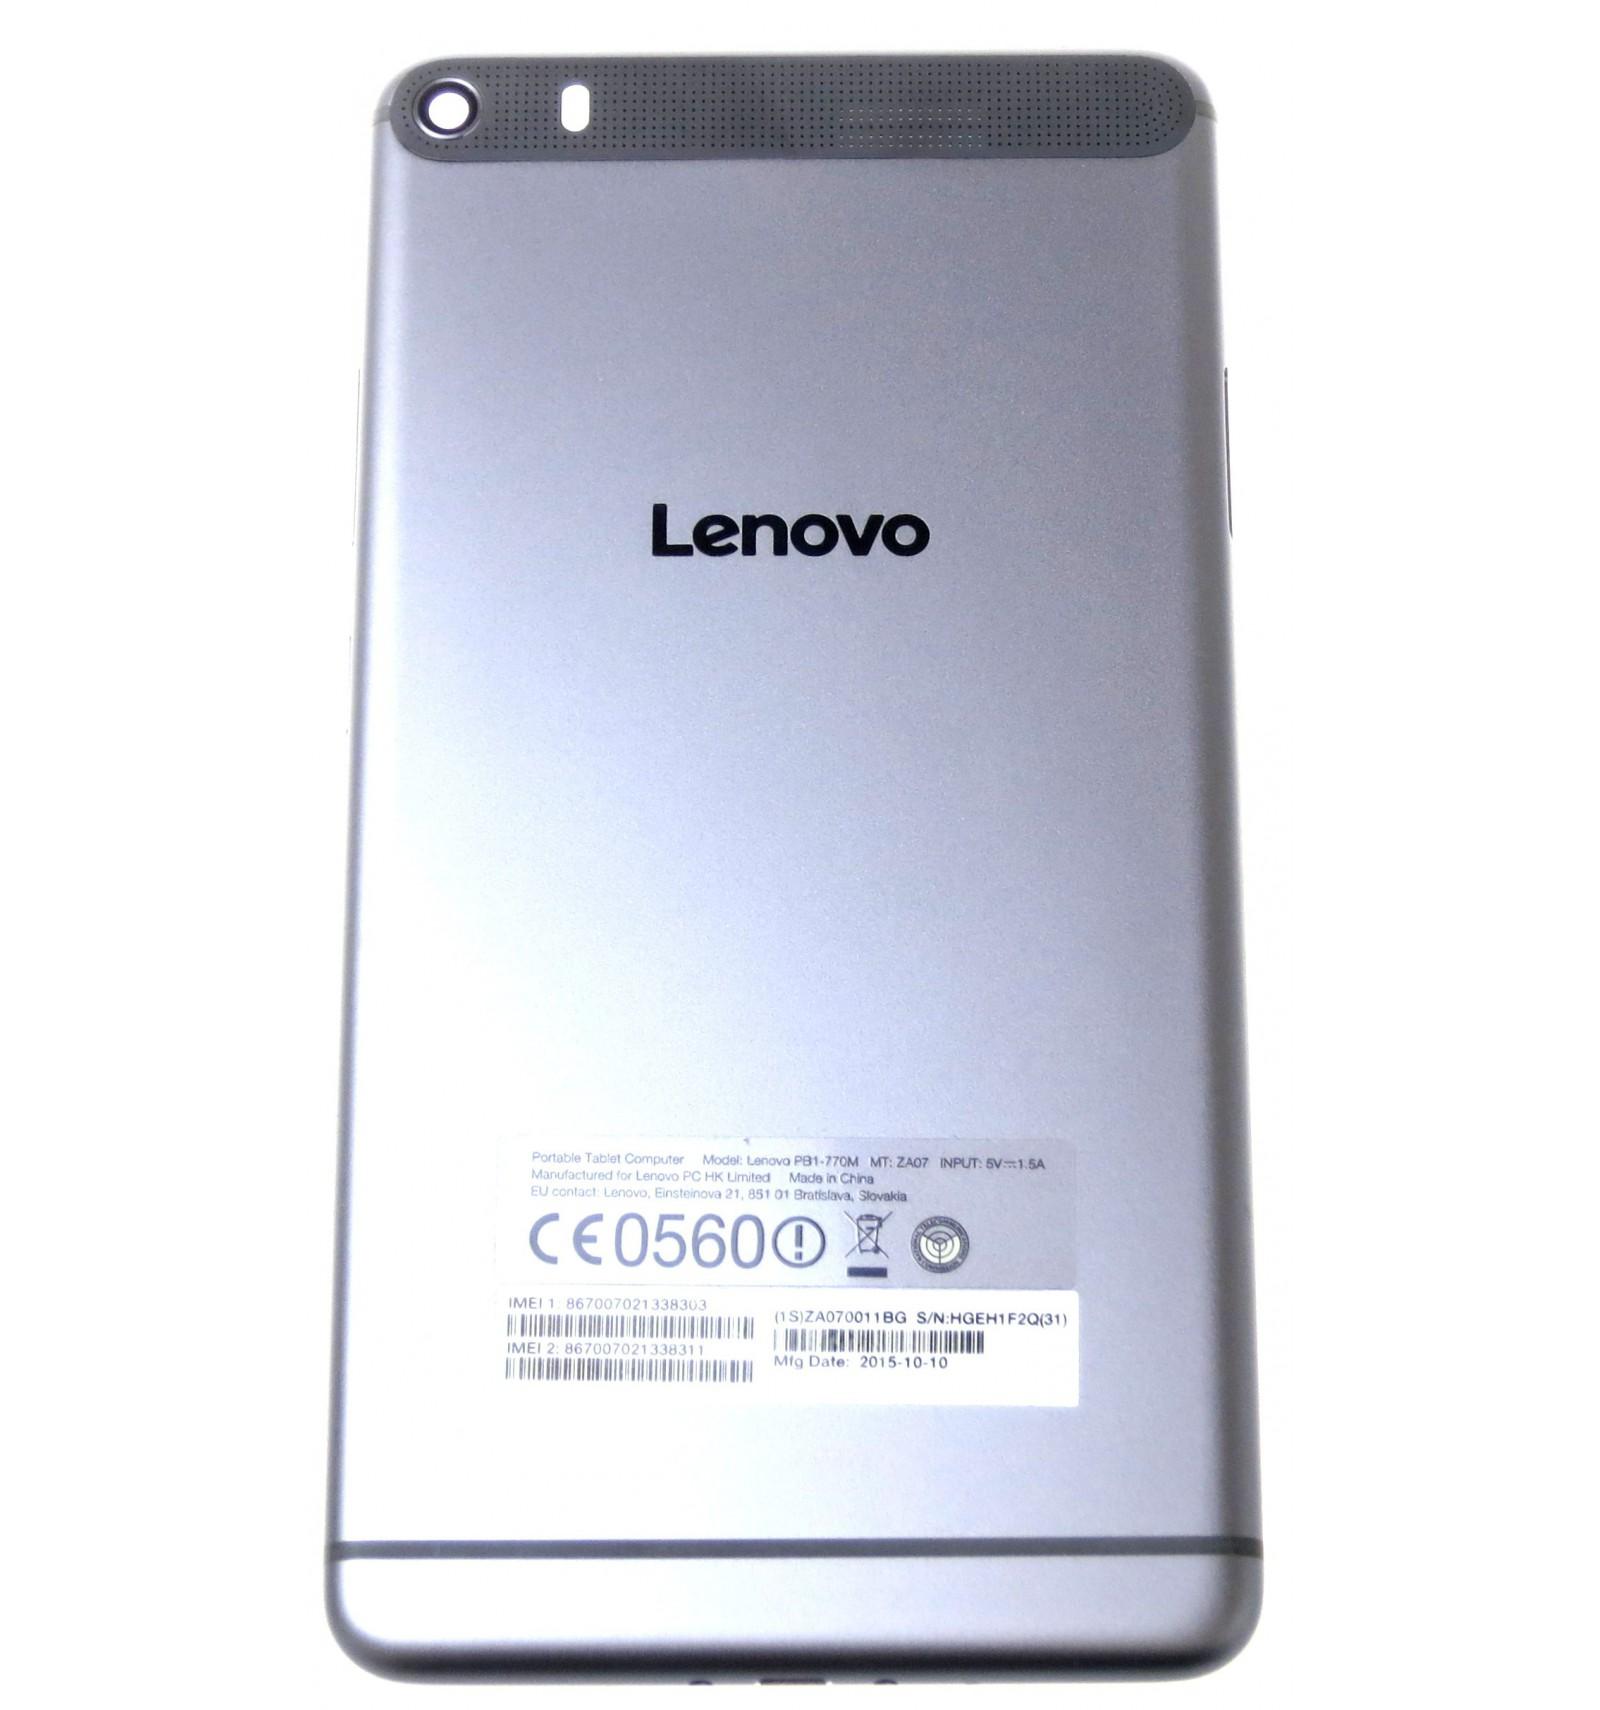 Battery Cover Black Original For Lenovo Phab Plus Idea Tab A3500 Blue